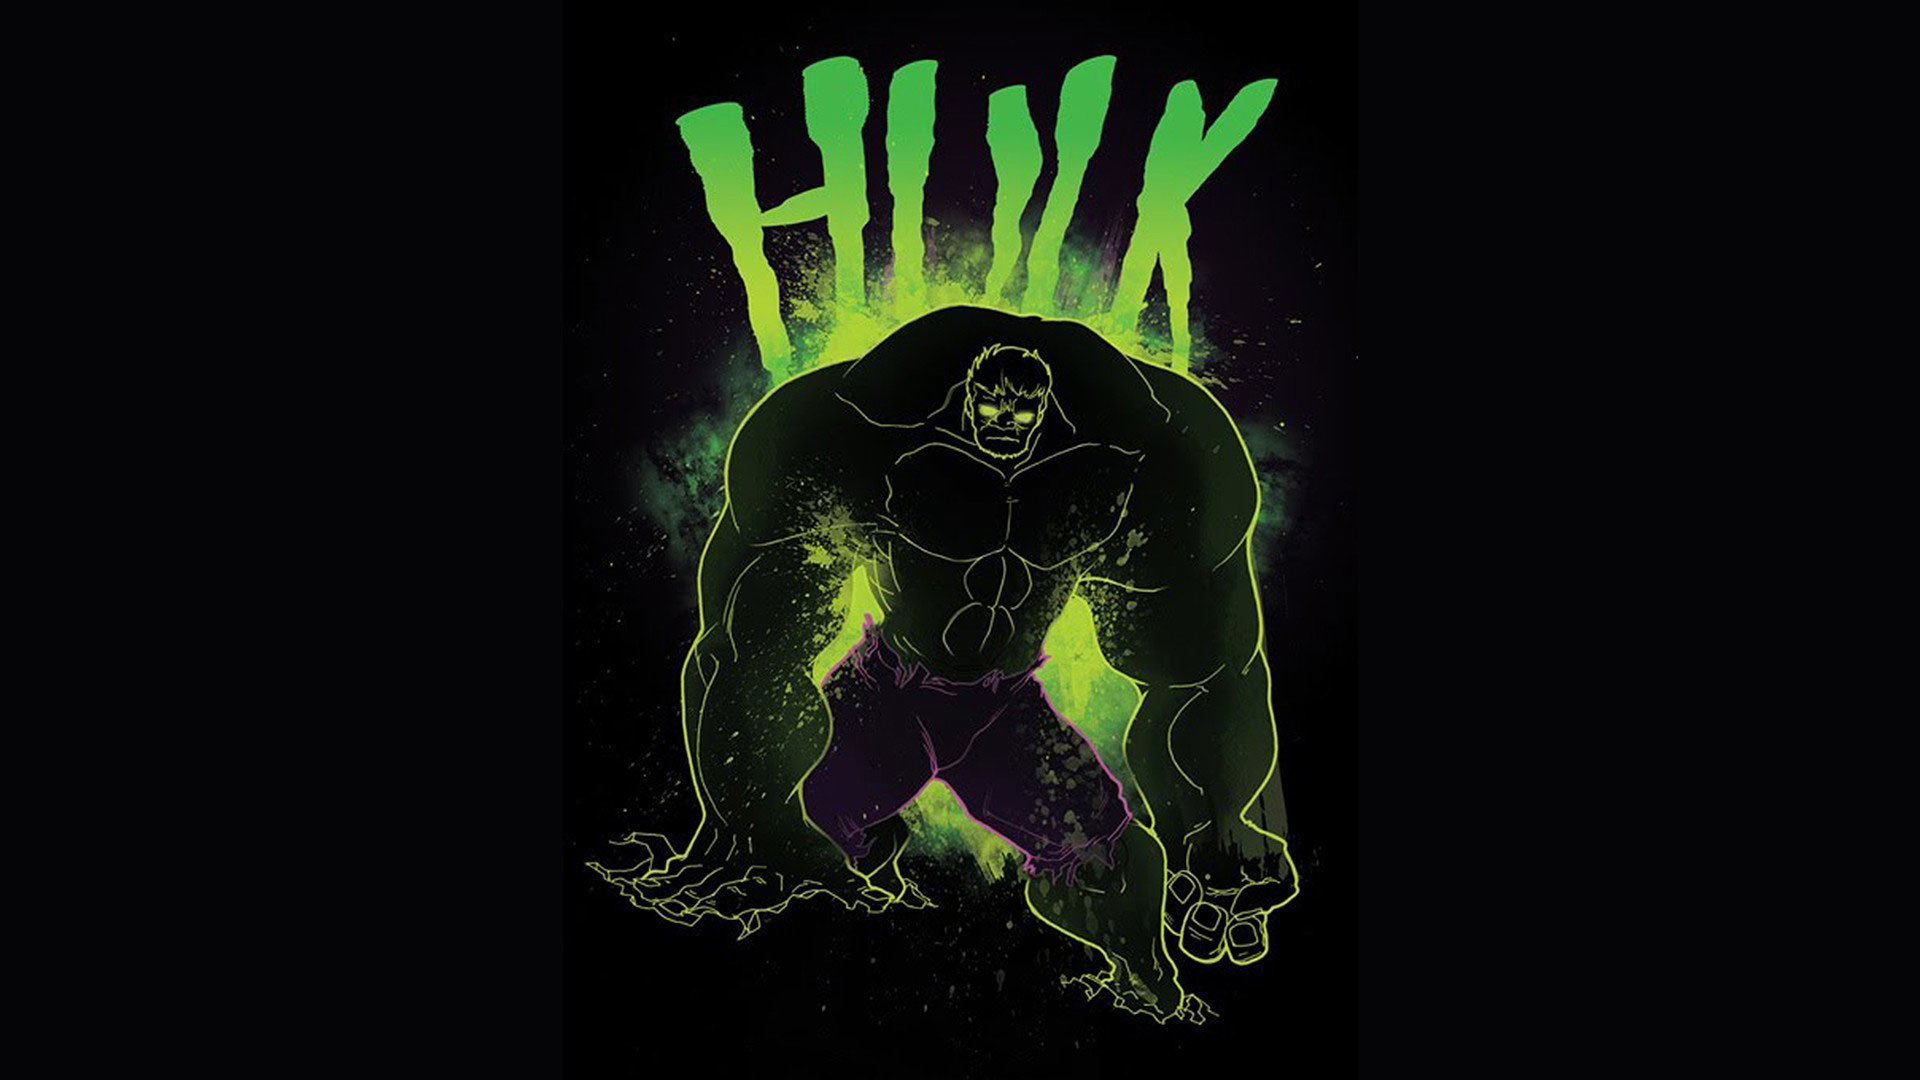 hd pics photos stunning attractive hulk 13 hd desktop background wallpaper